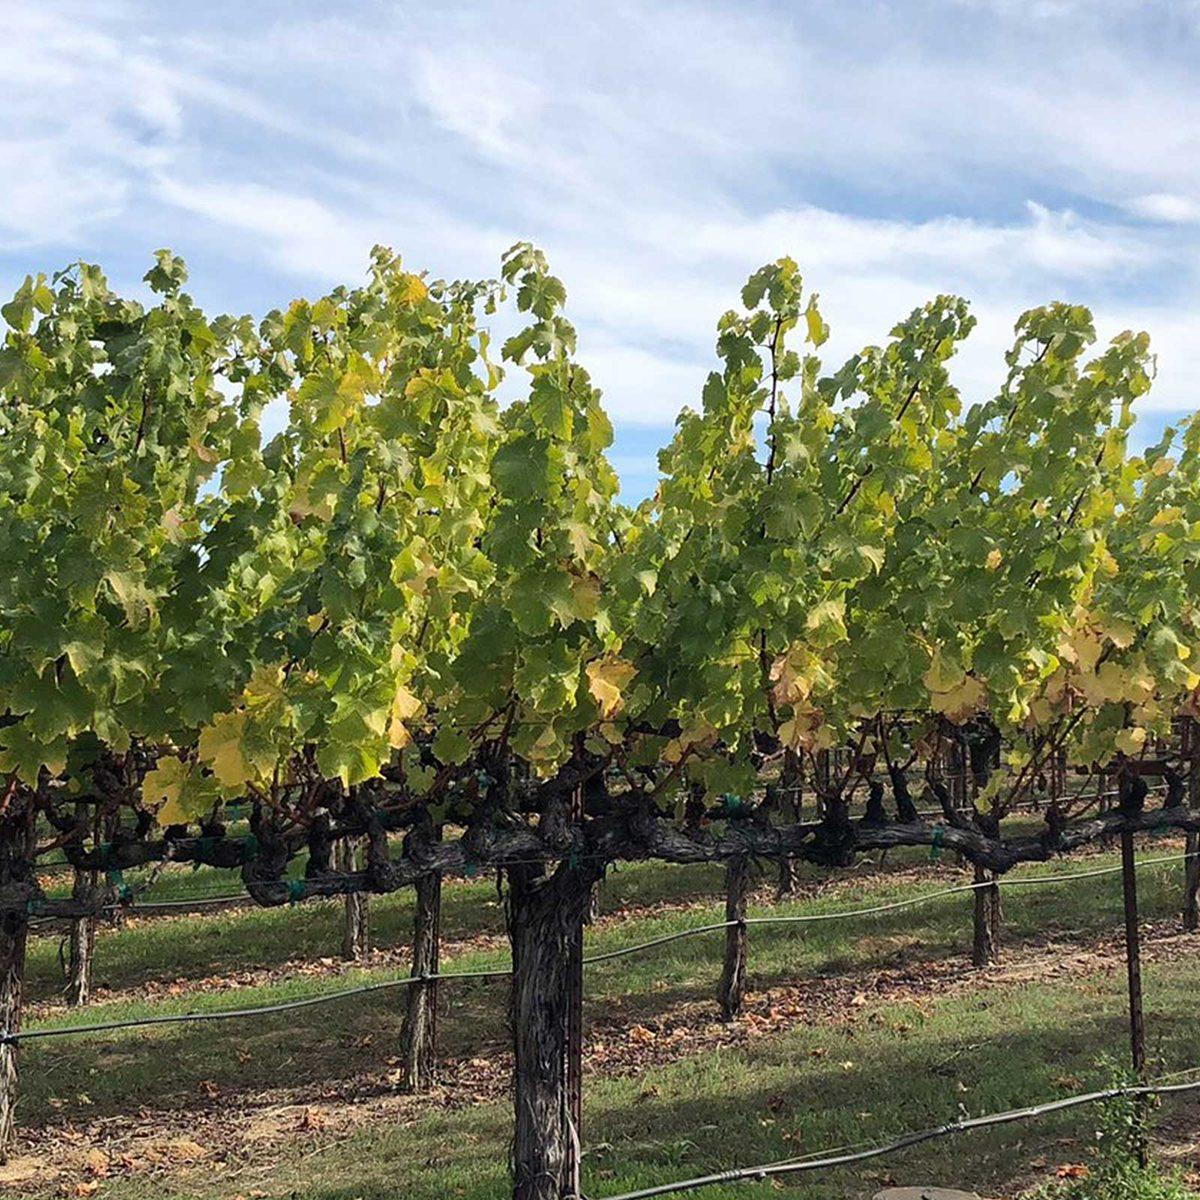 Orchard in Healdsburg, California